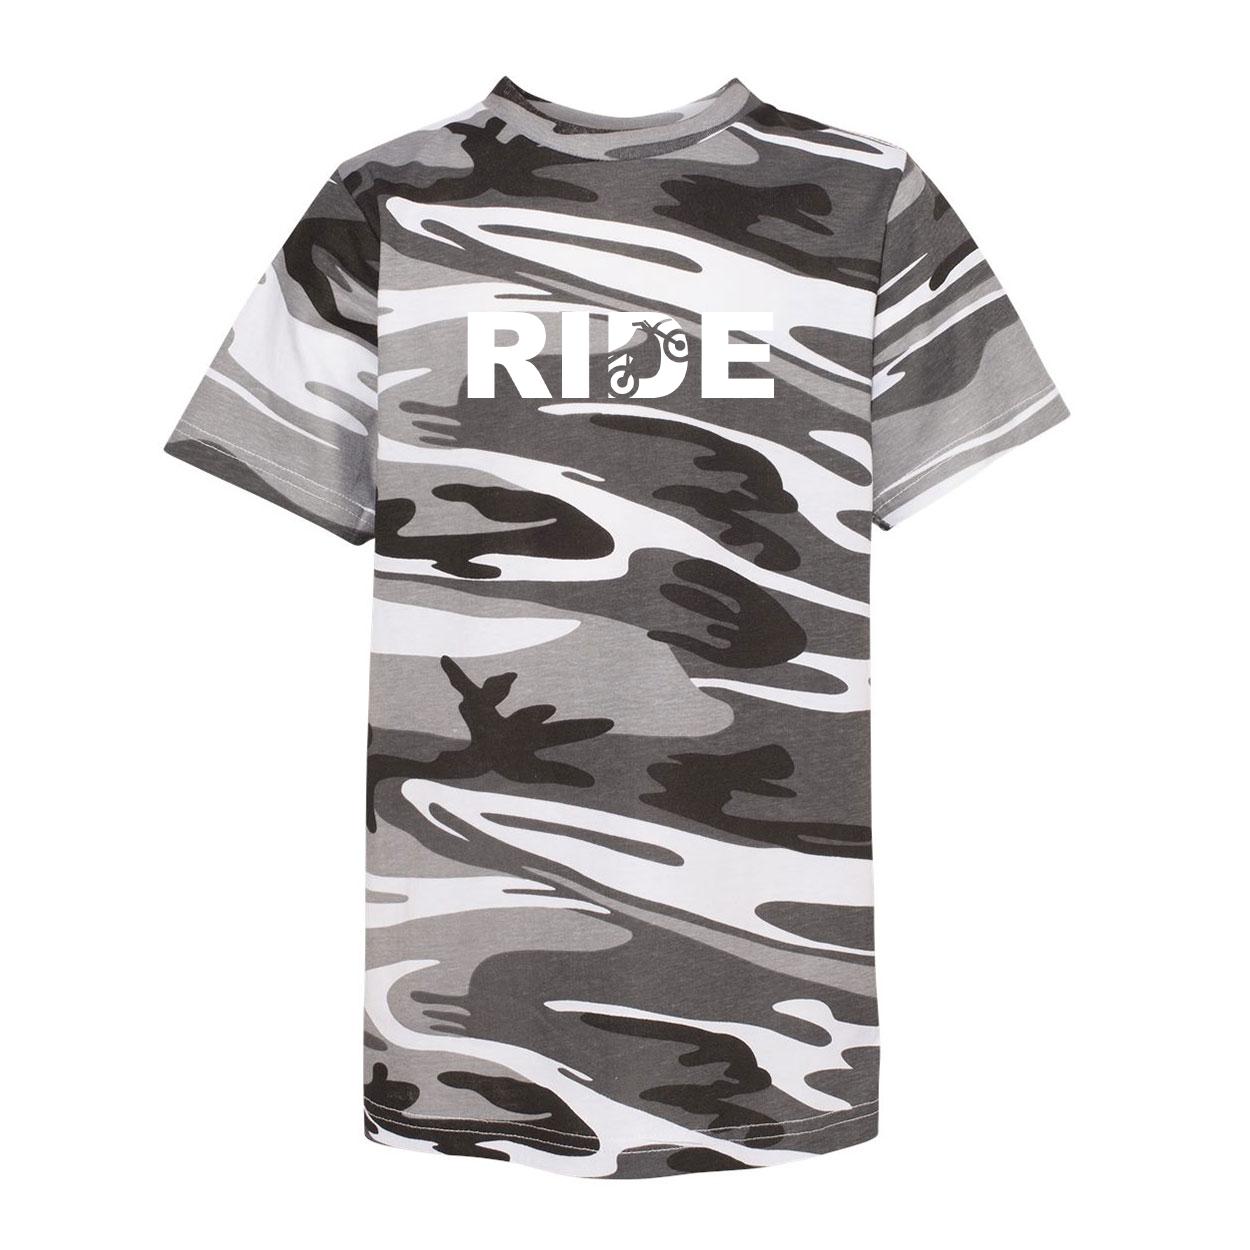 Ride Moto Logo Classic Youth Unisex T-Shirt Urban Camo (White Logo)